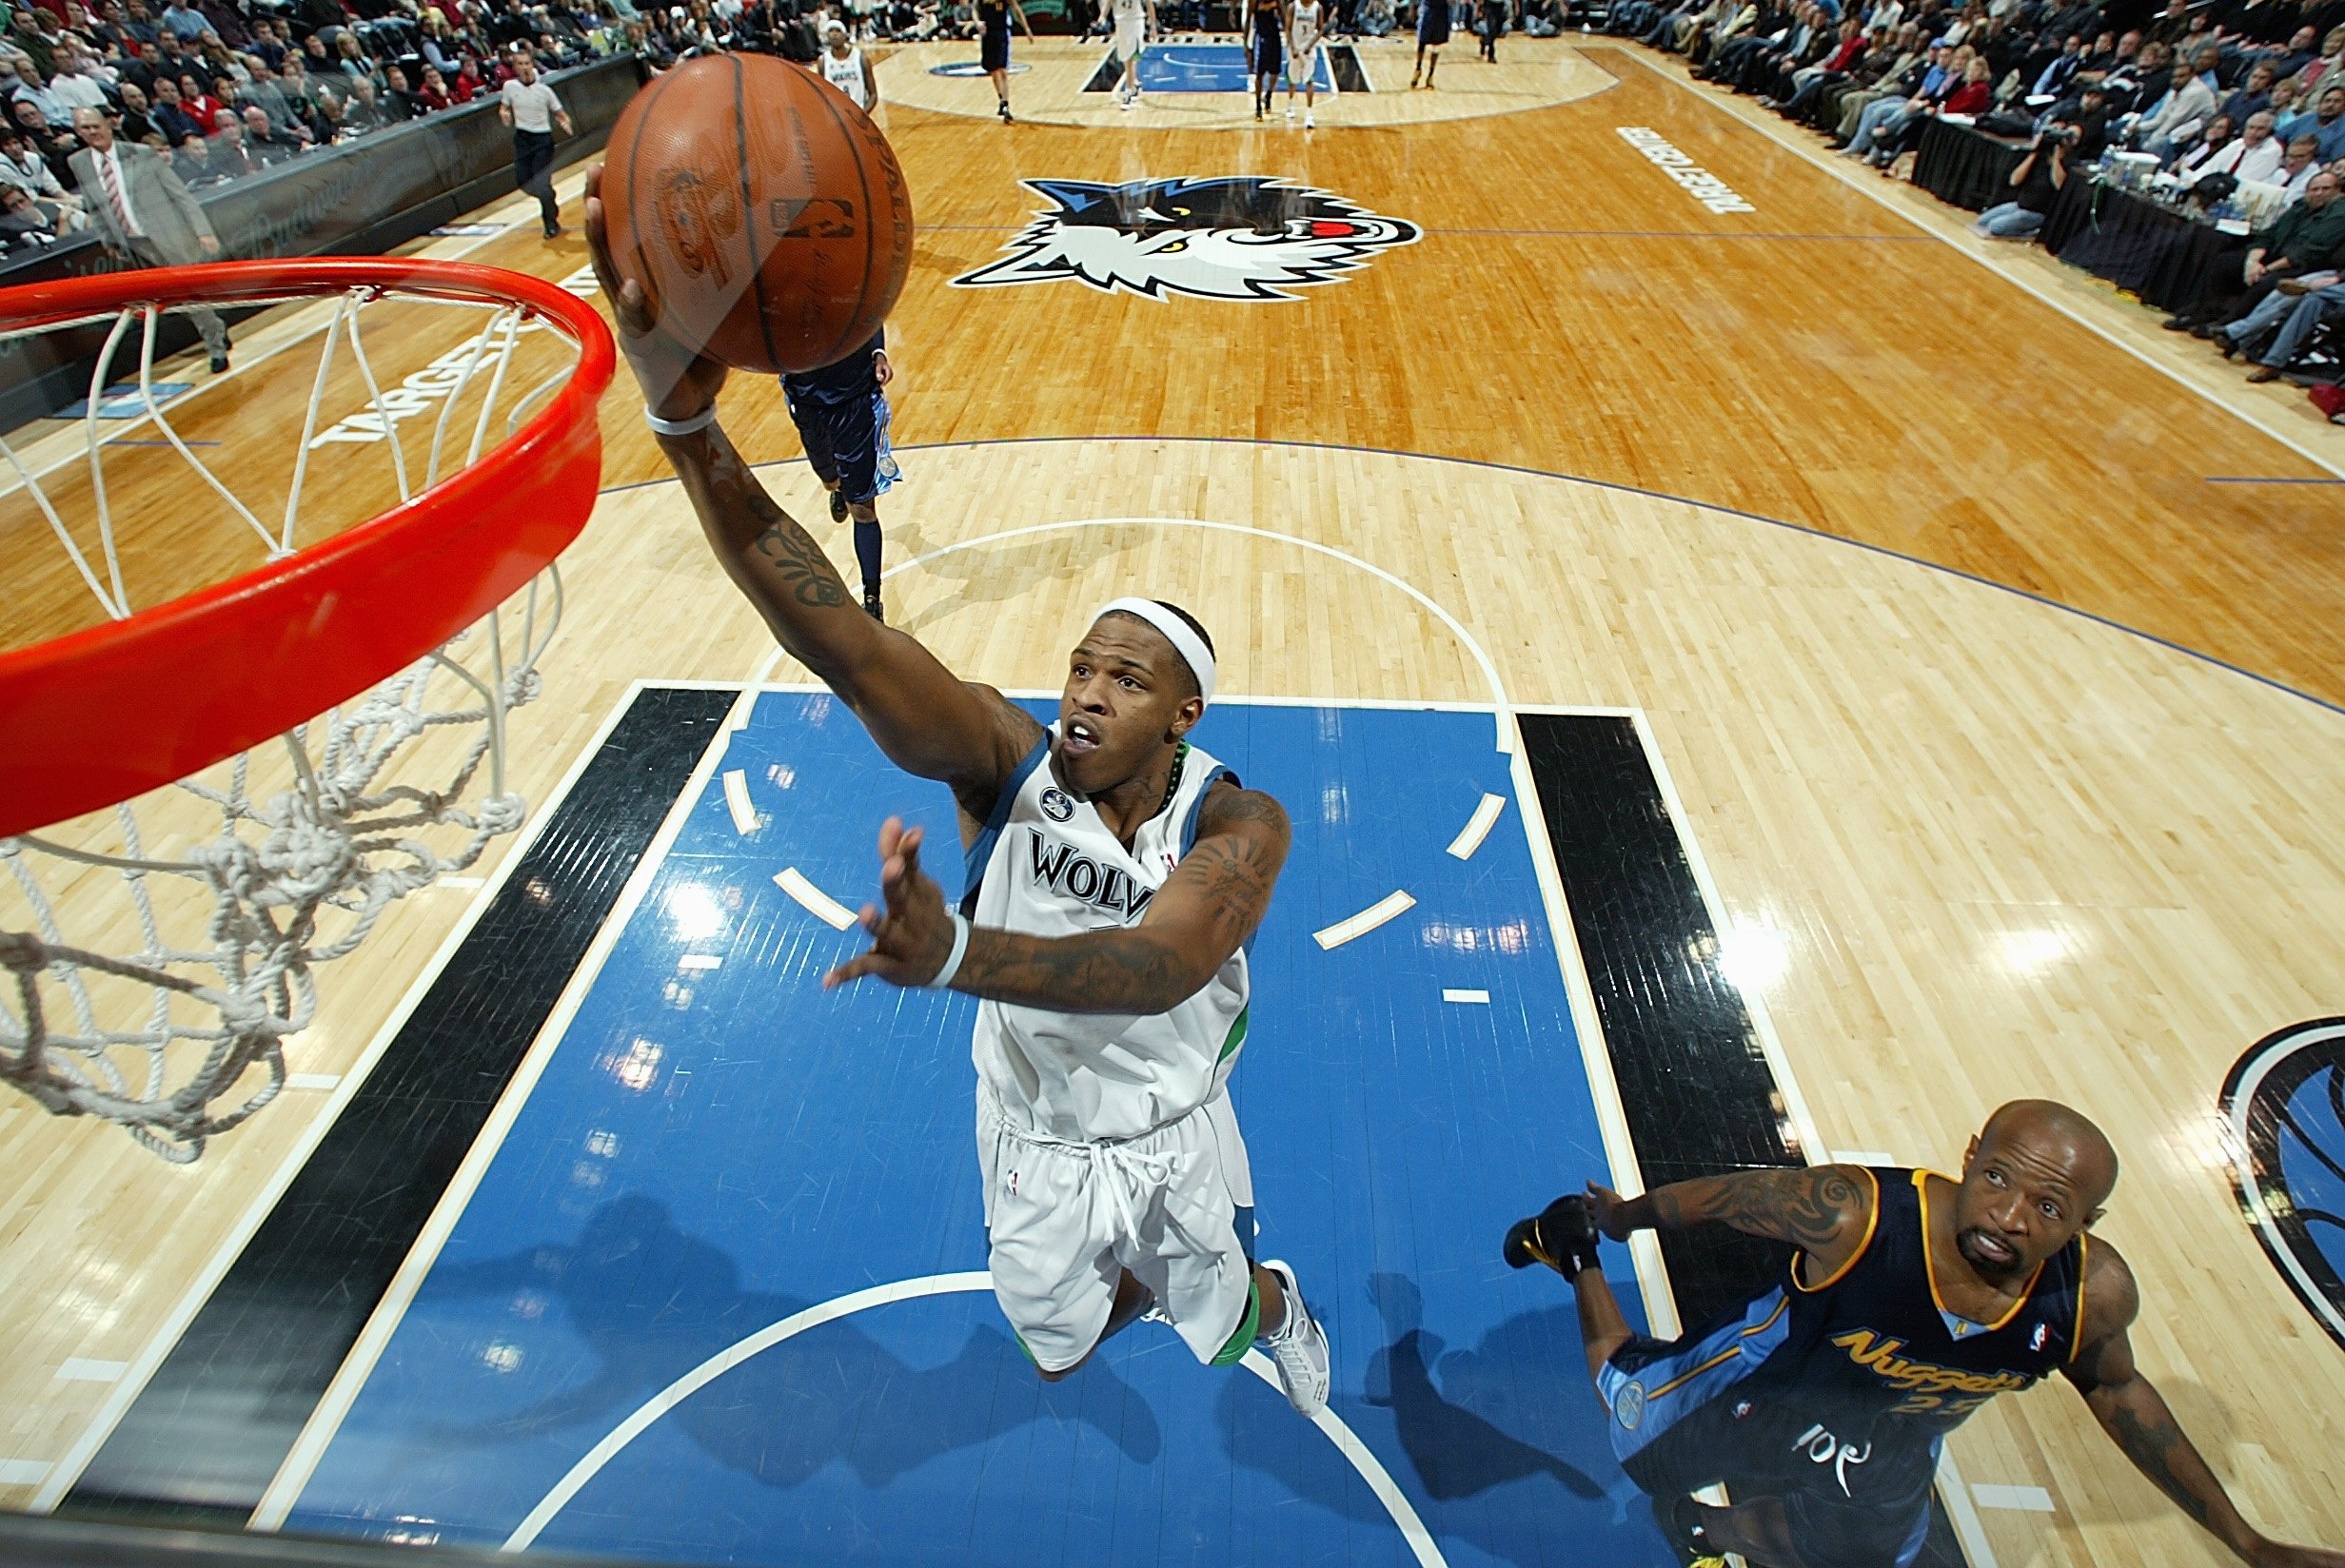 Ex-astro da NBA, McCants já está pronto para estrear no NBB (David Sherman/NBAE)